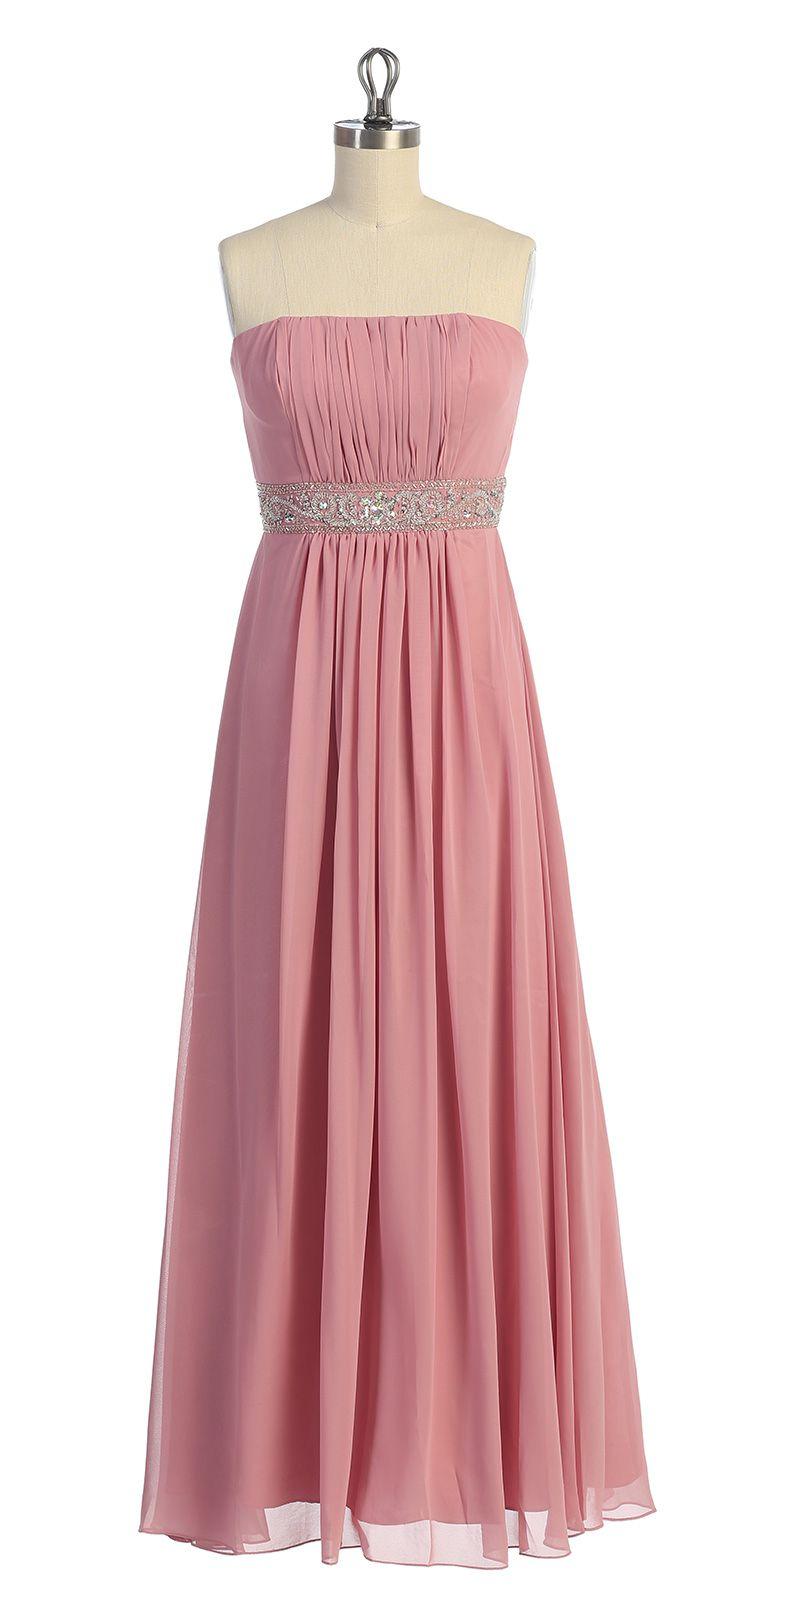 Dusty rose chiffon strapless gathered beaded long dress dldr